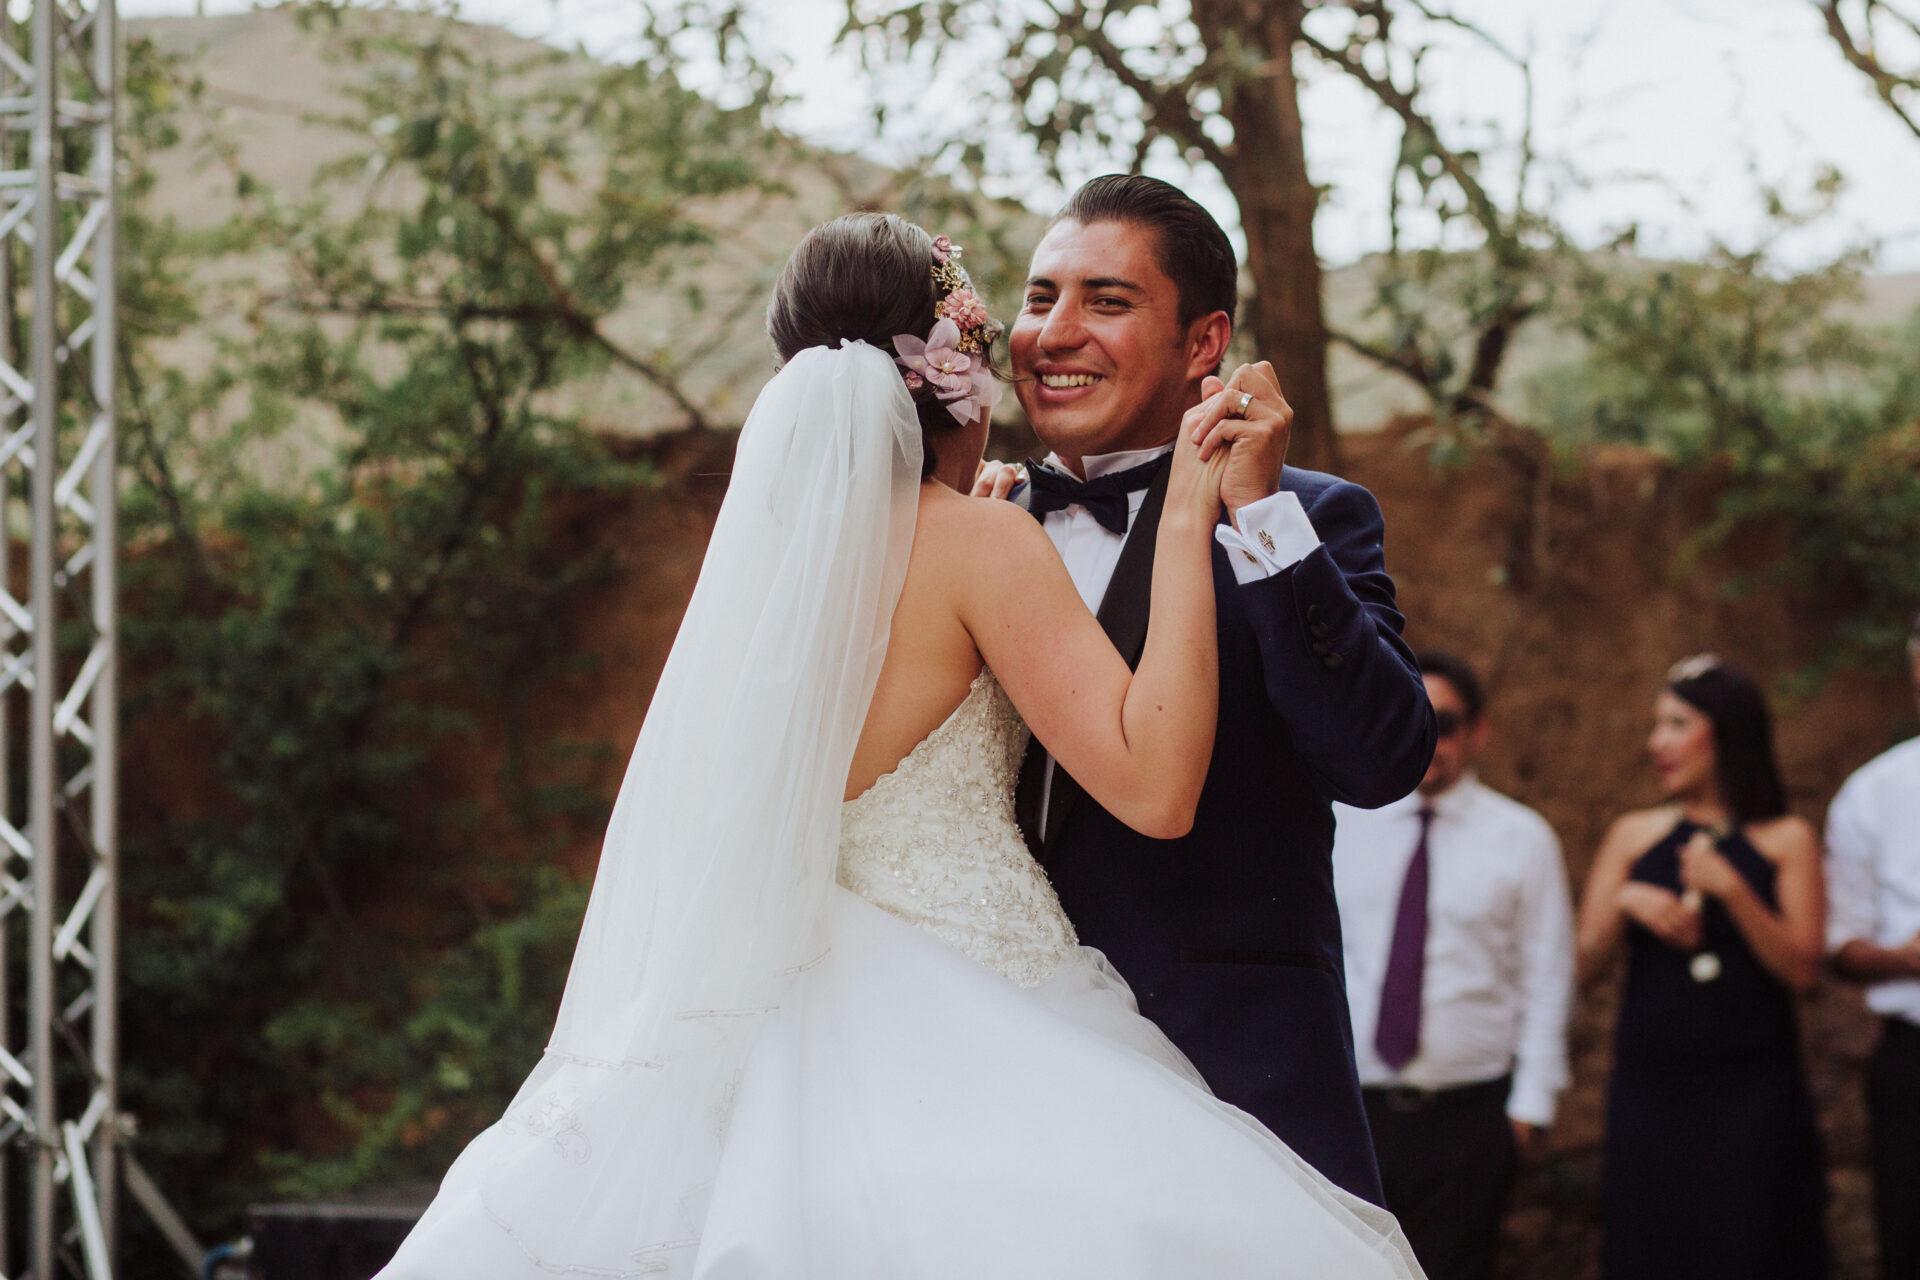 javier_noriega_fotografo_bodas_exhacienda_las_mercedes_zacatecas_wedding_photographer13a